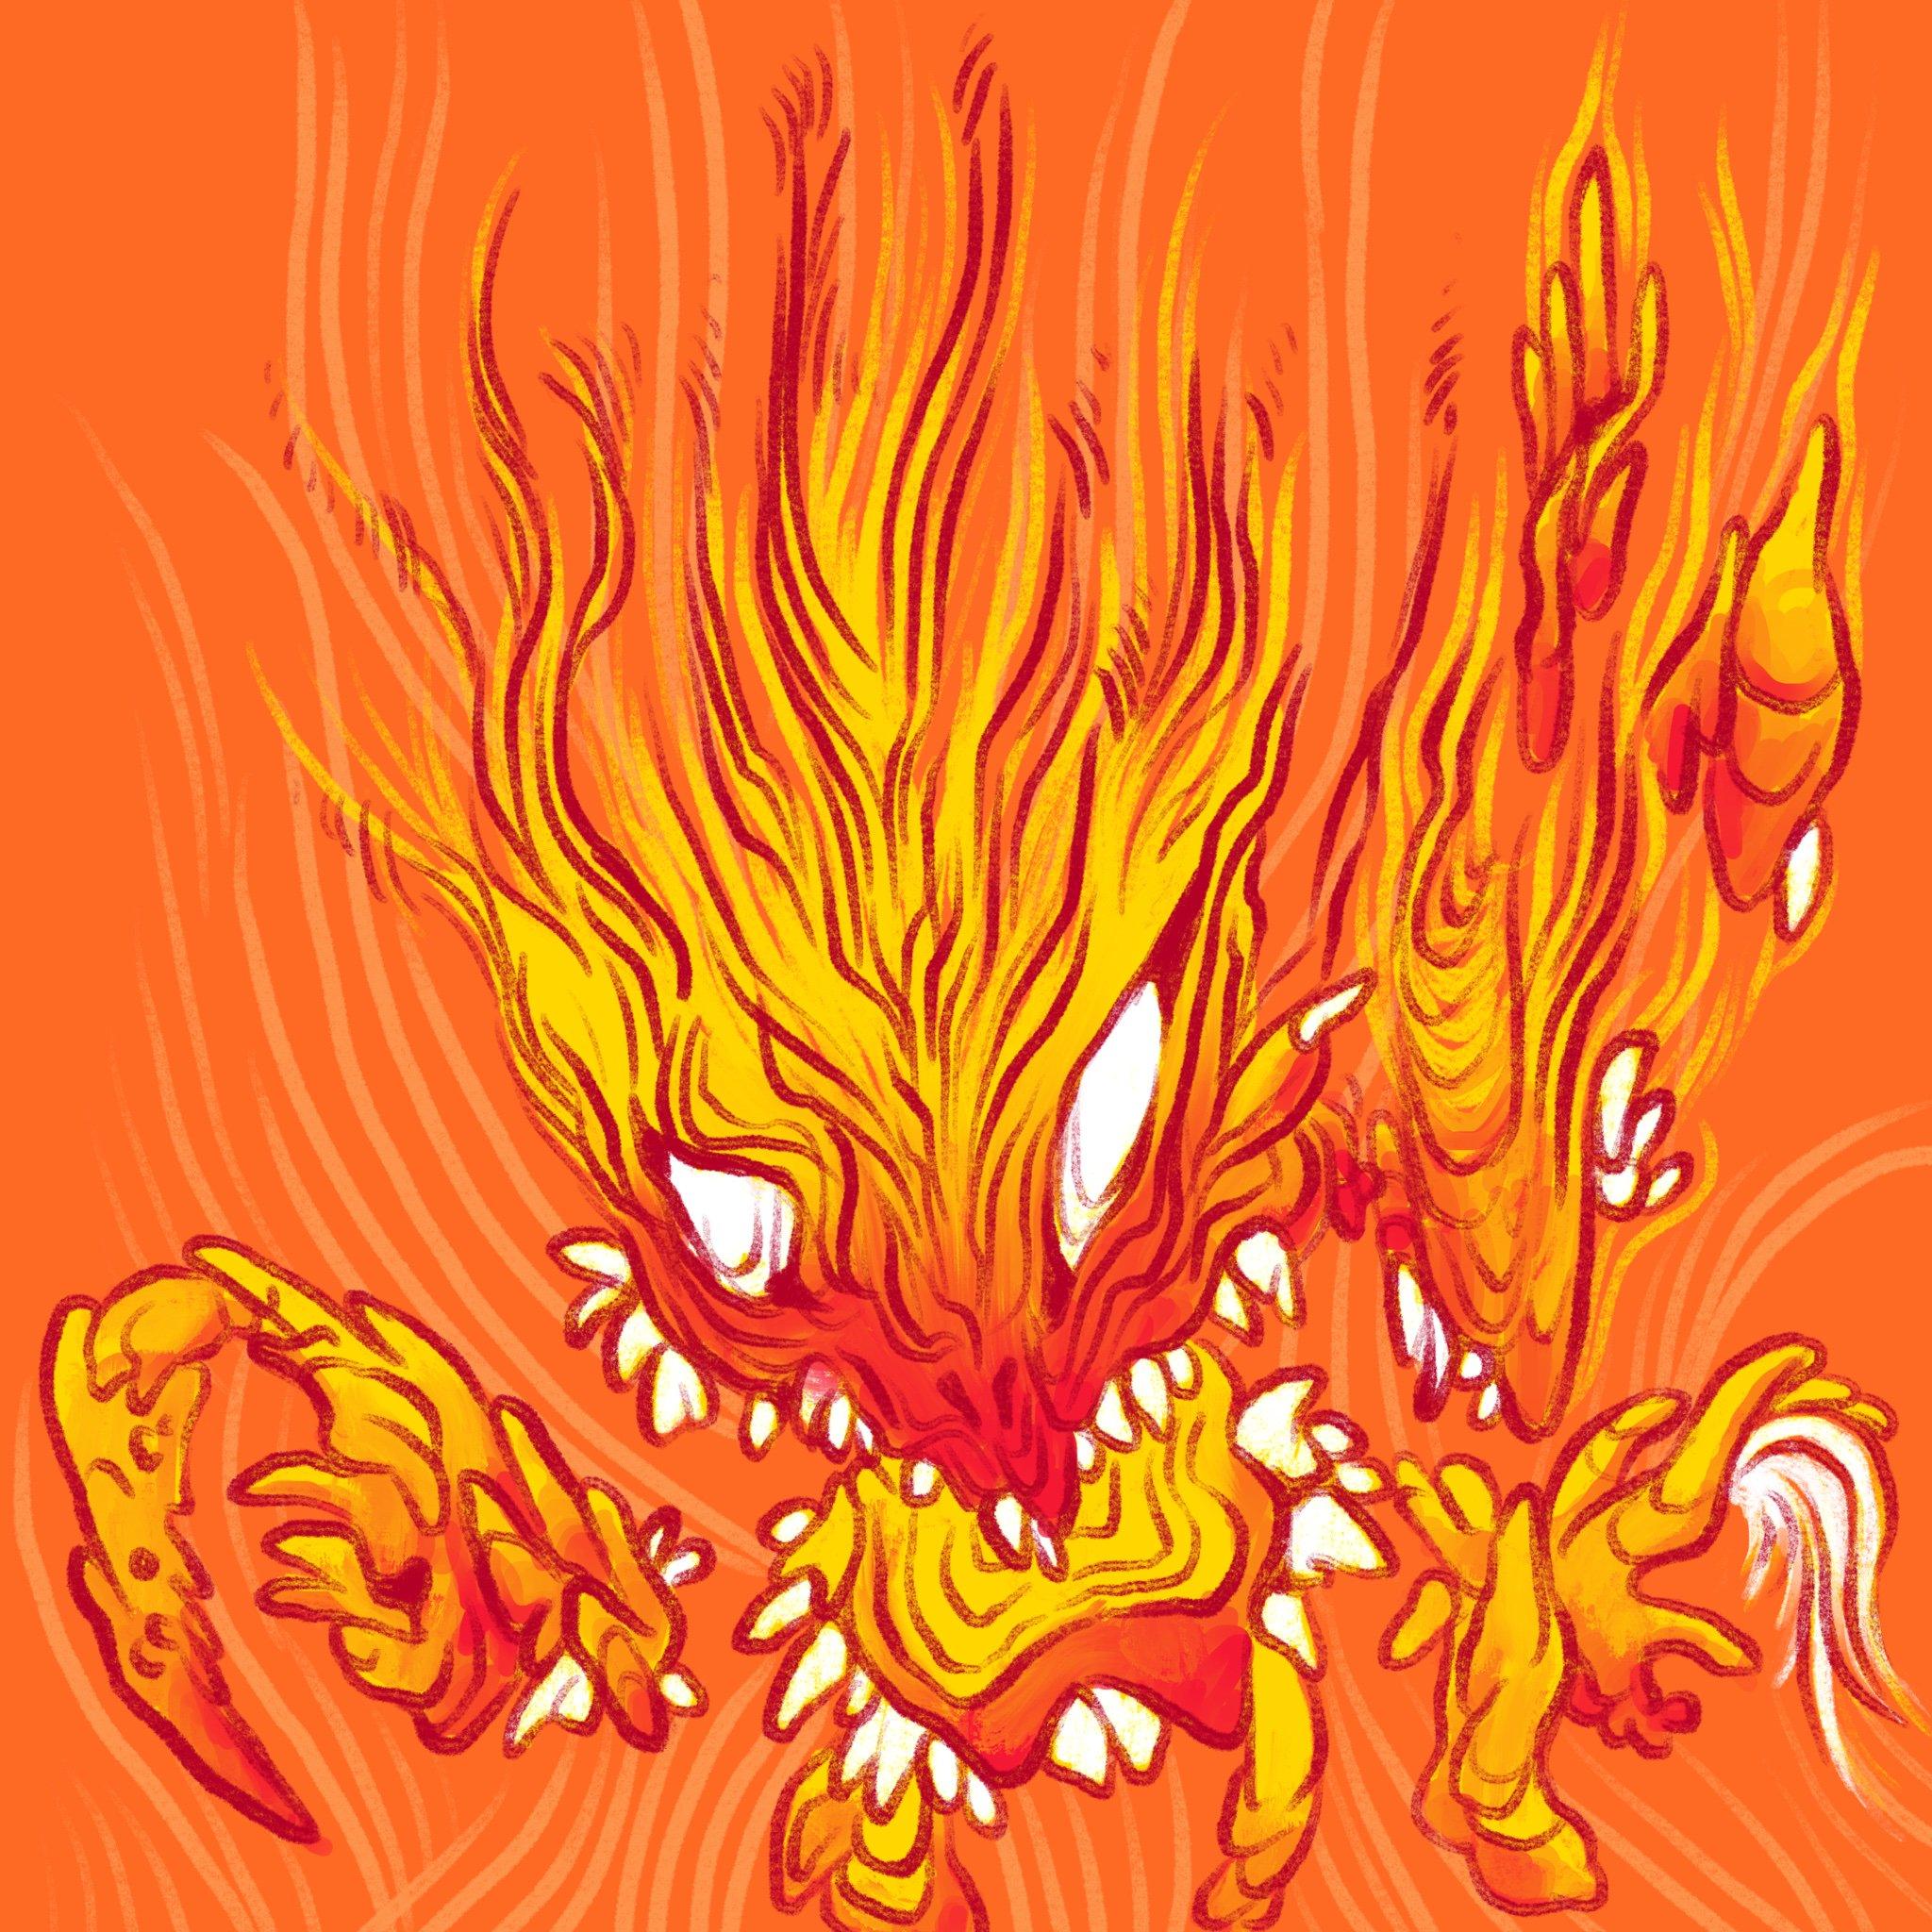 Flame Crab